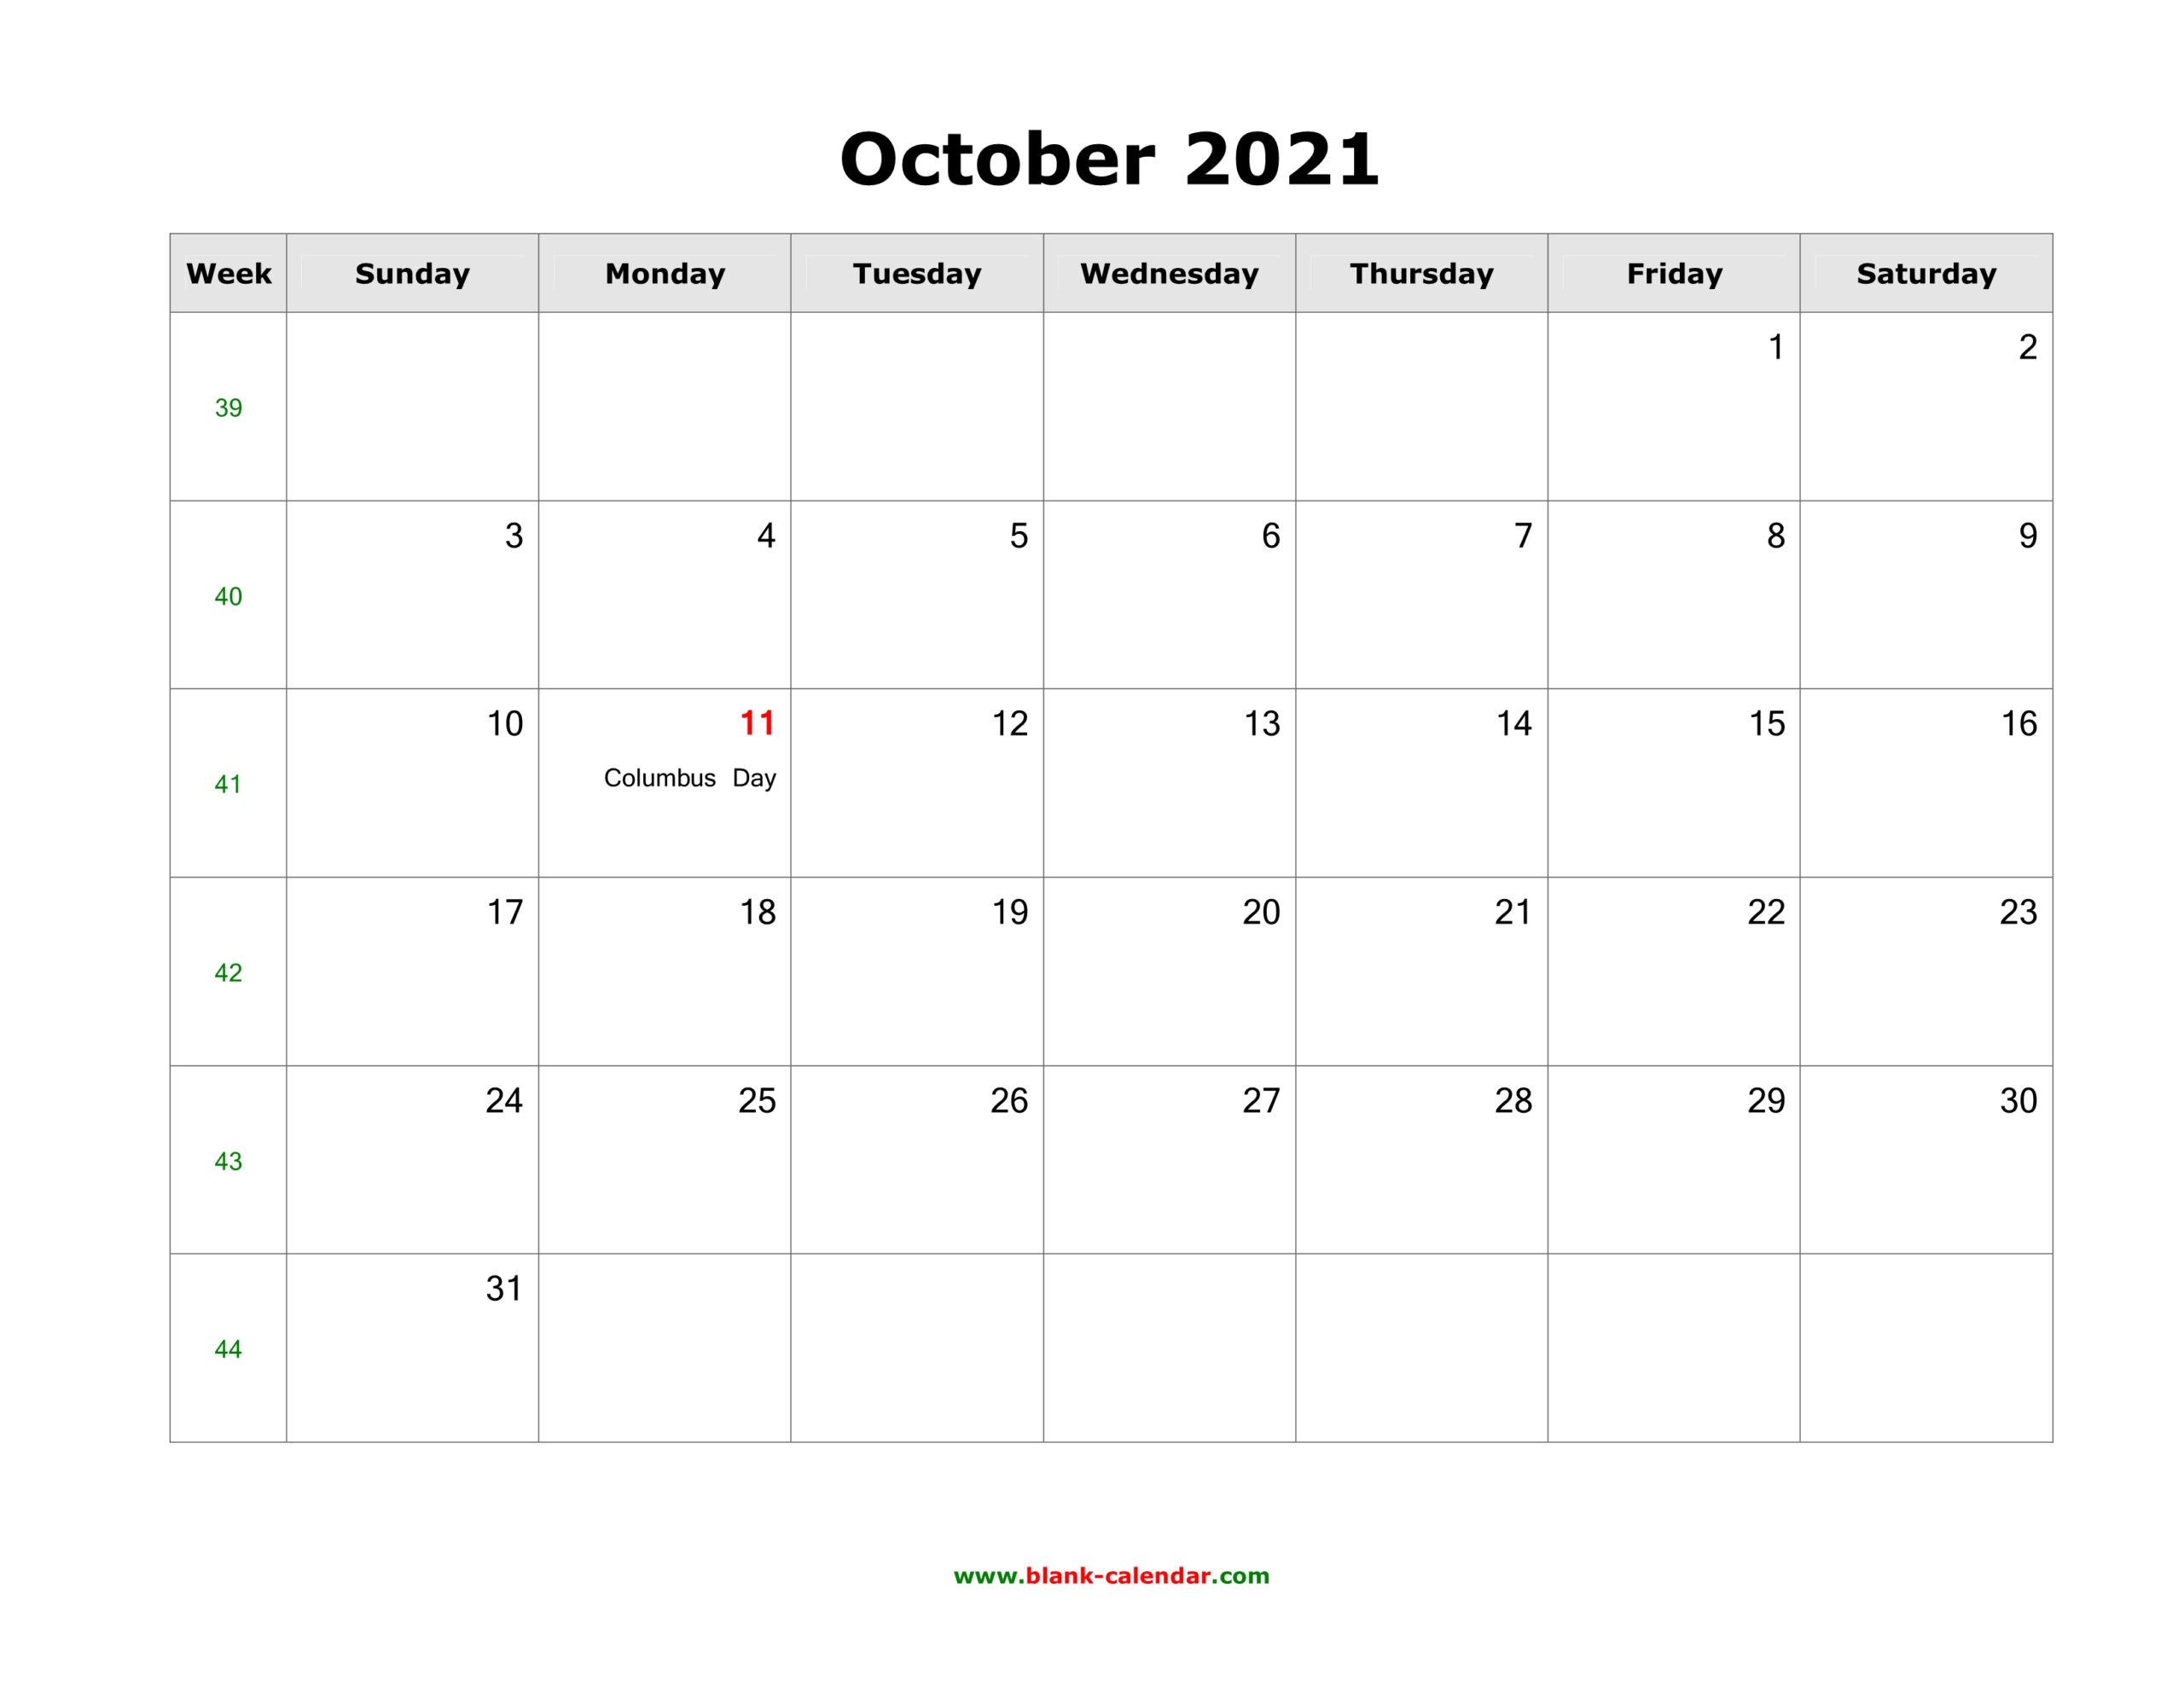 Calendar October 2021 Google Docs | Printable March with regard to Calendar 2021 October Fill In